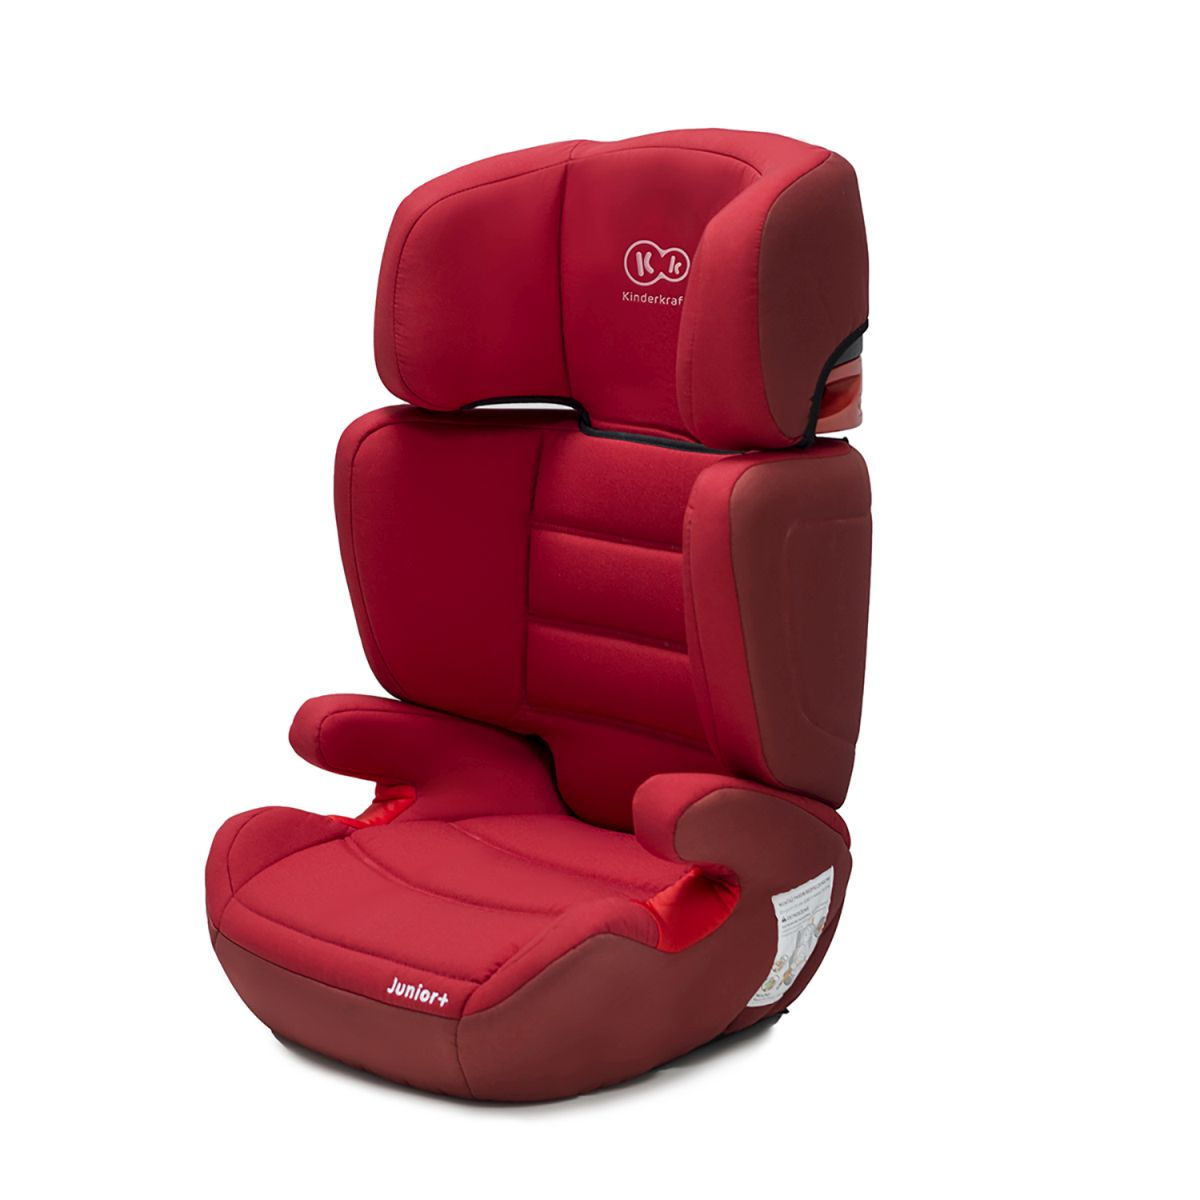 voiture chaise pour enfant 15 de 36 kg groupe 2 3 si ge b b neuf junior rouge ebay. Black Bedroom Furniture Sets. Home Design Ideas